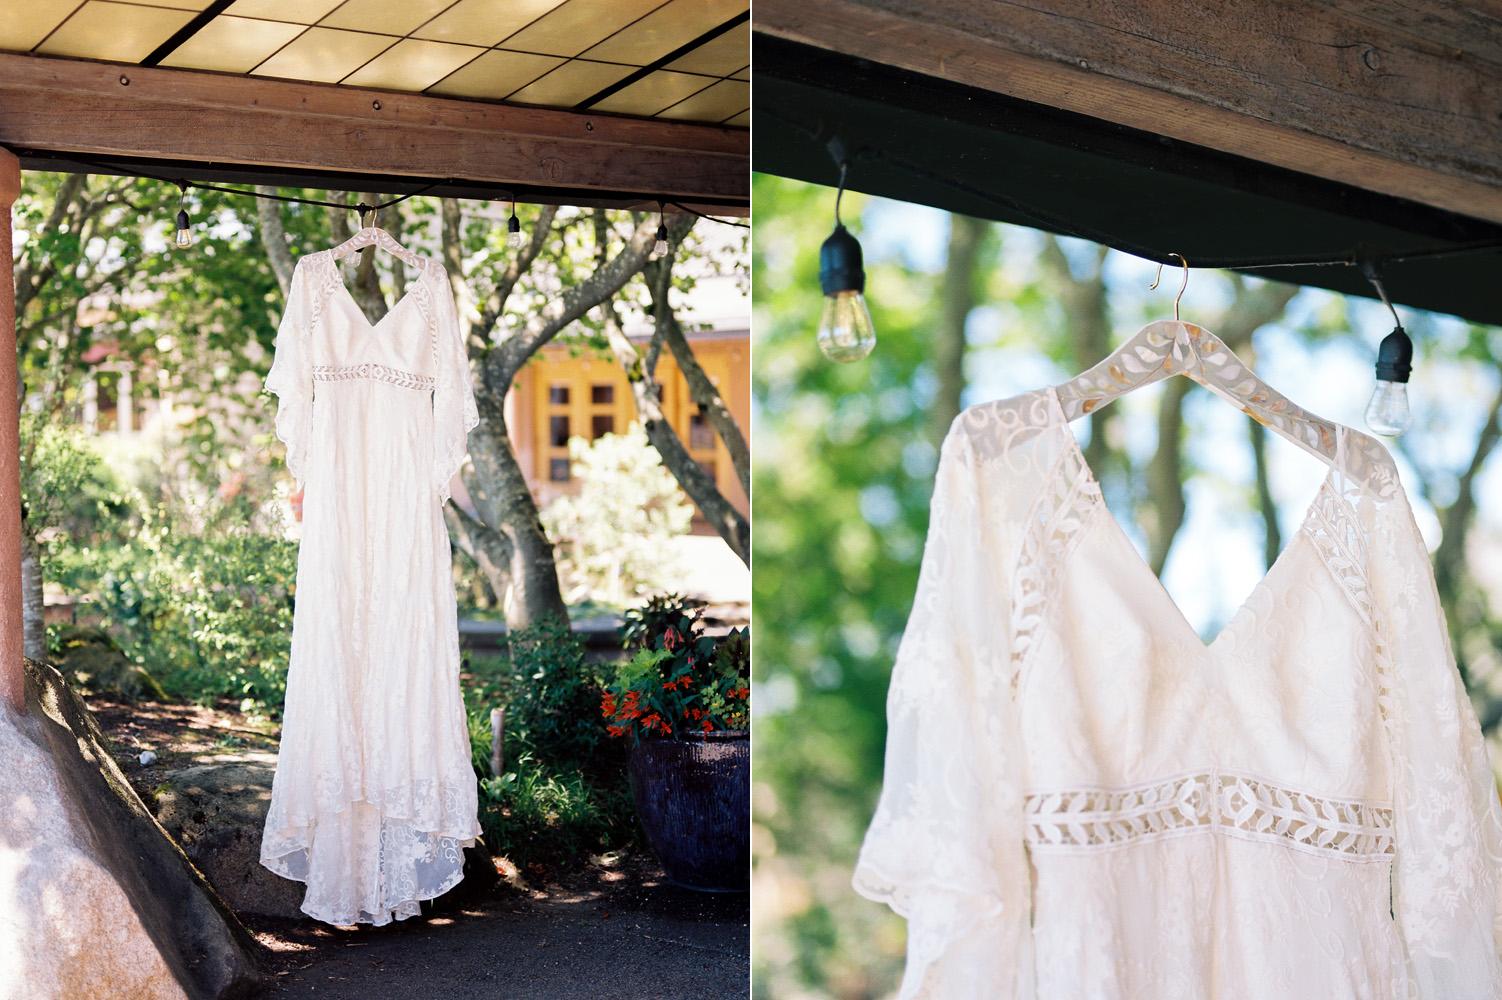 Seattle The Dress Theory Wedding and Rue de Seine Wedding Dress